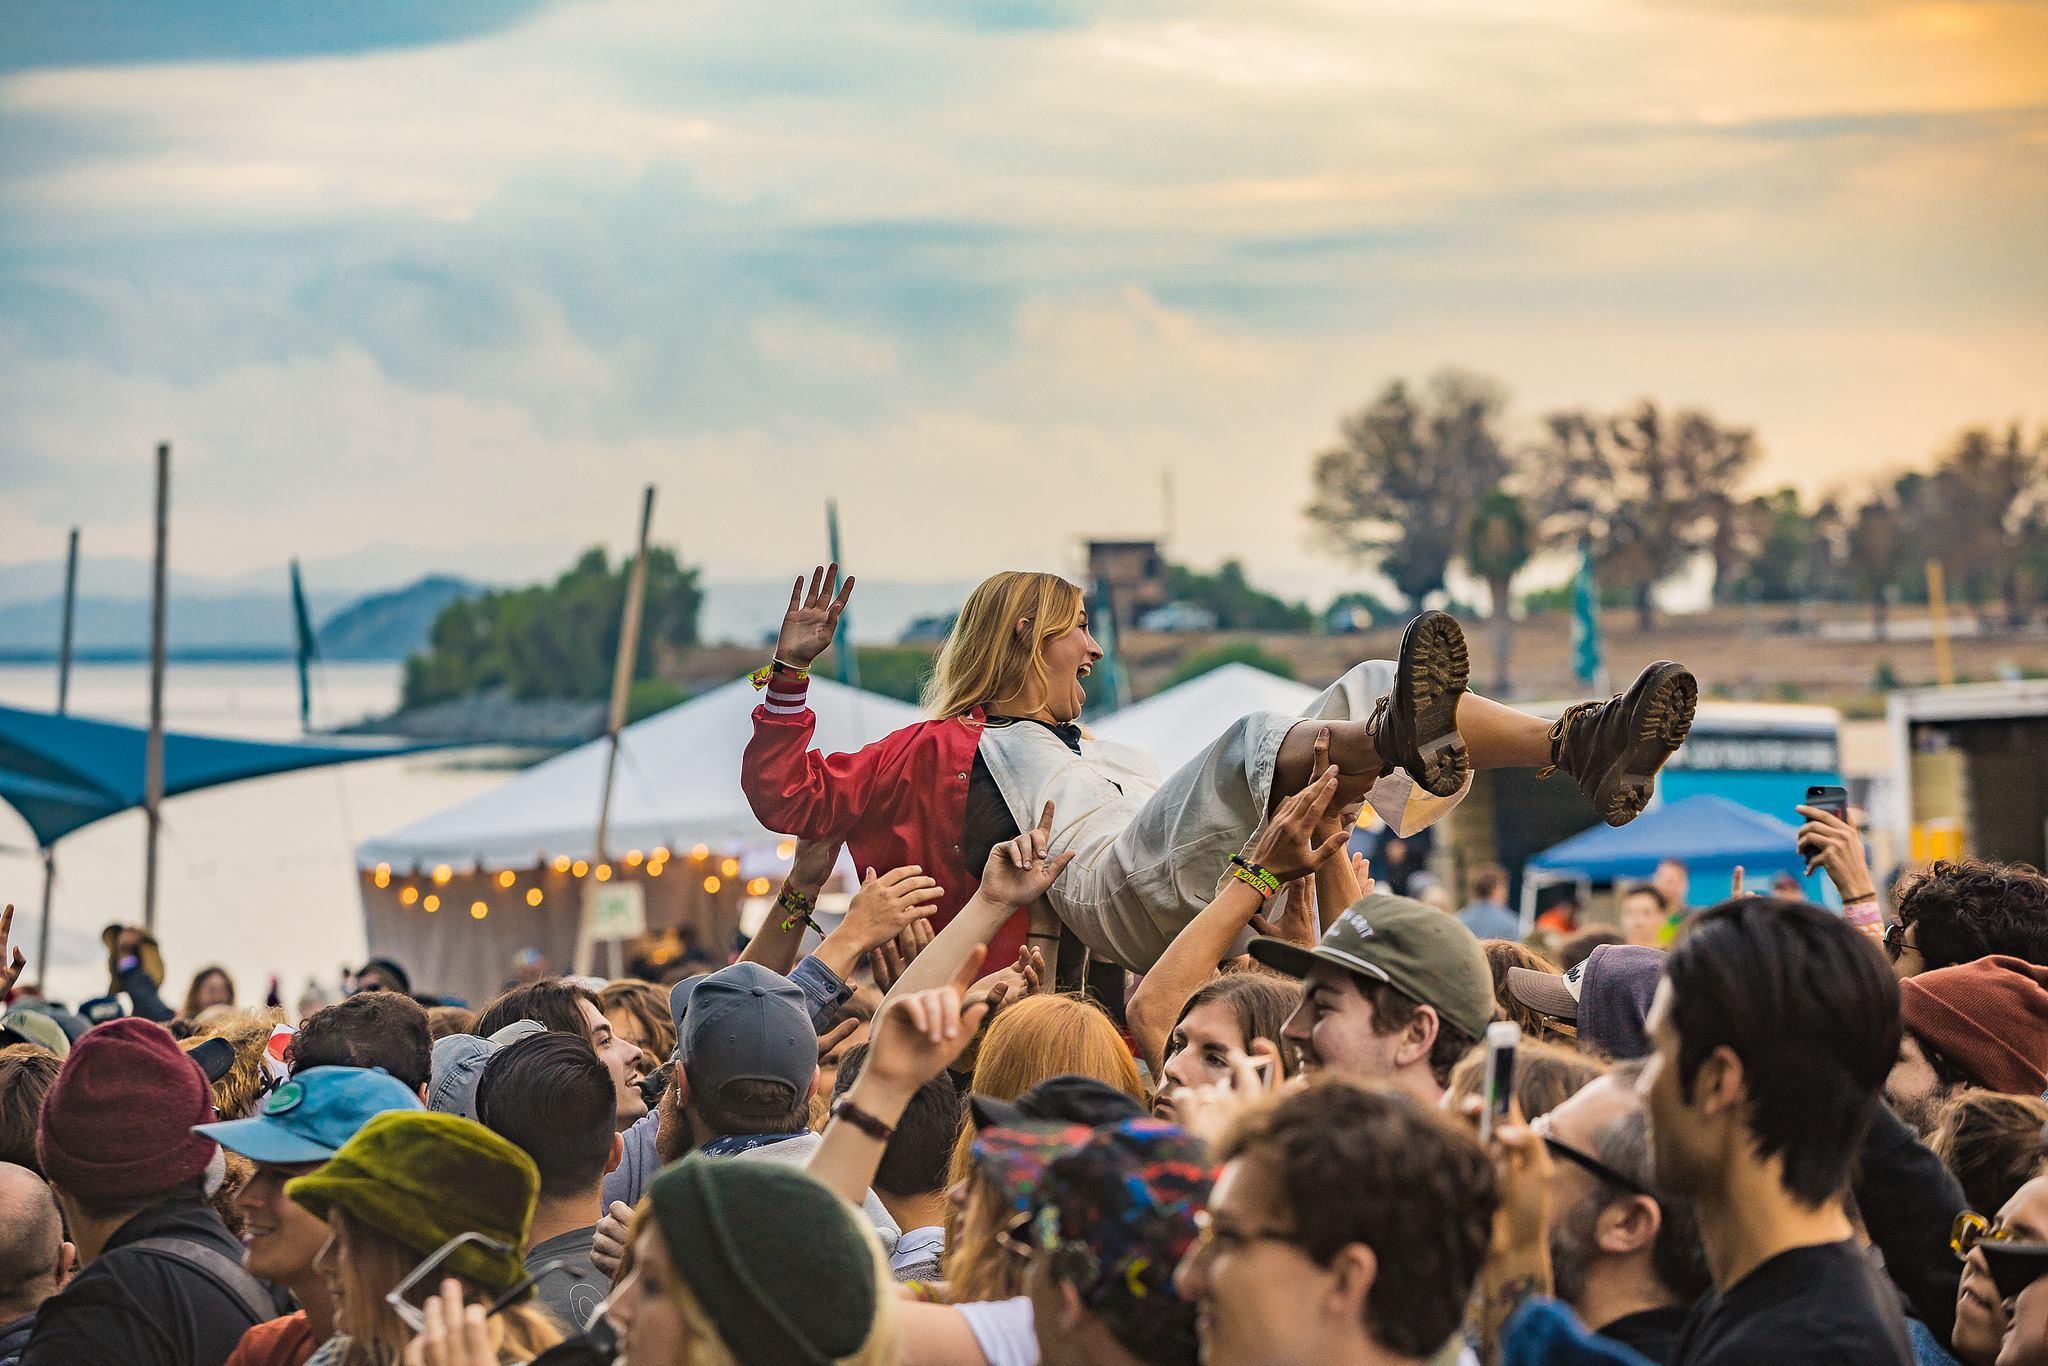 d01187e17f18 Top 10 Music Festivals in California 2019 - Festicket Magazine